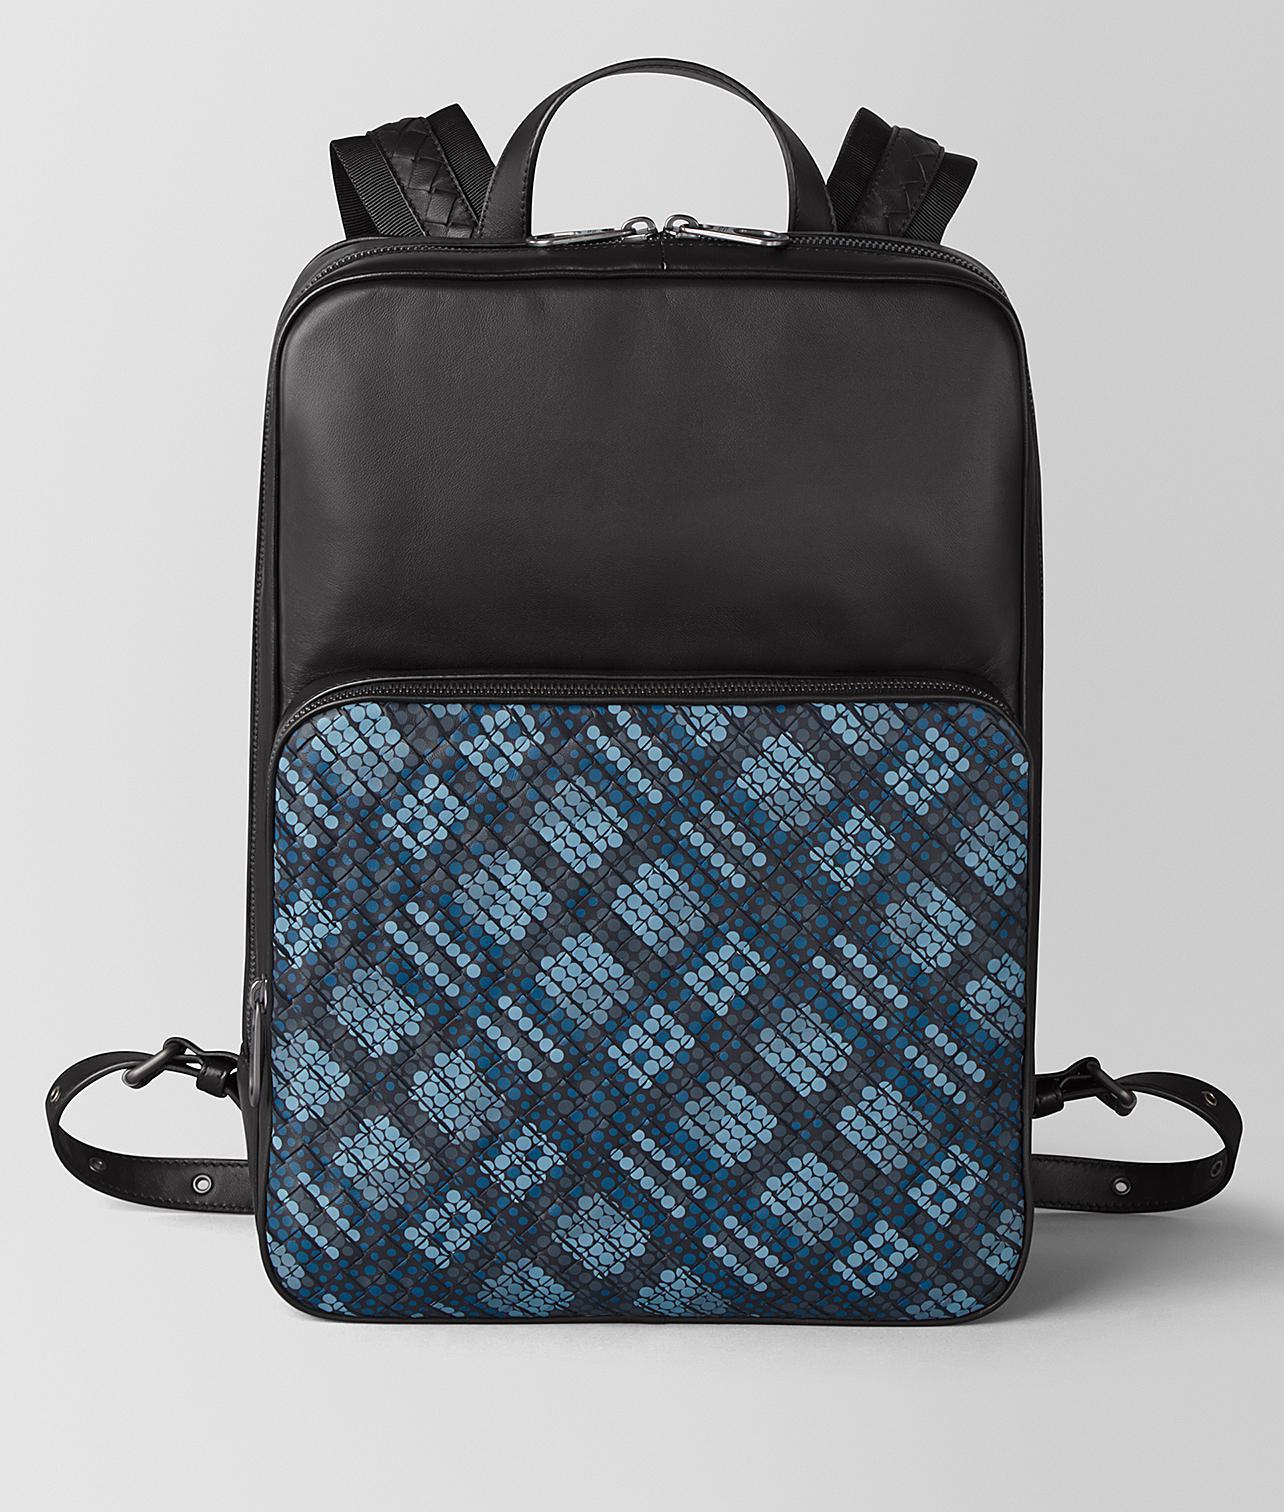 Lyst - Bottega Veneta Medium Double Brick Backpack In Tartan Dots in ... 9cb0c4fa47853